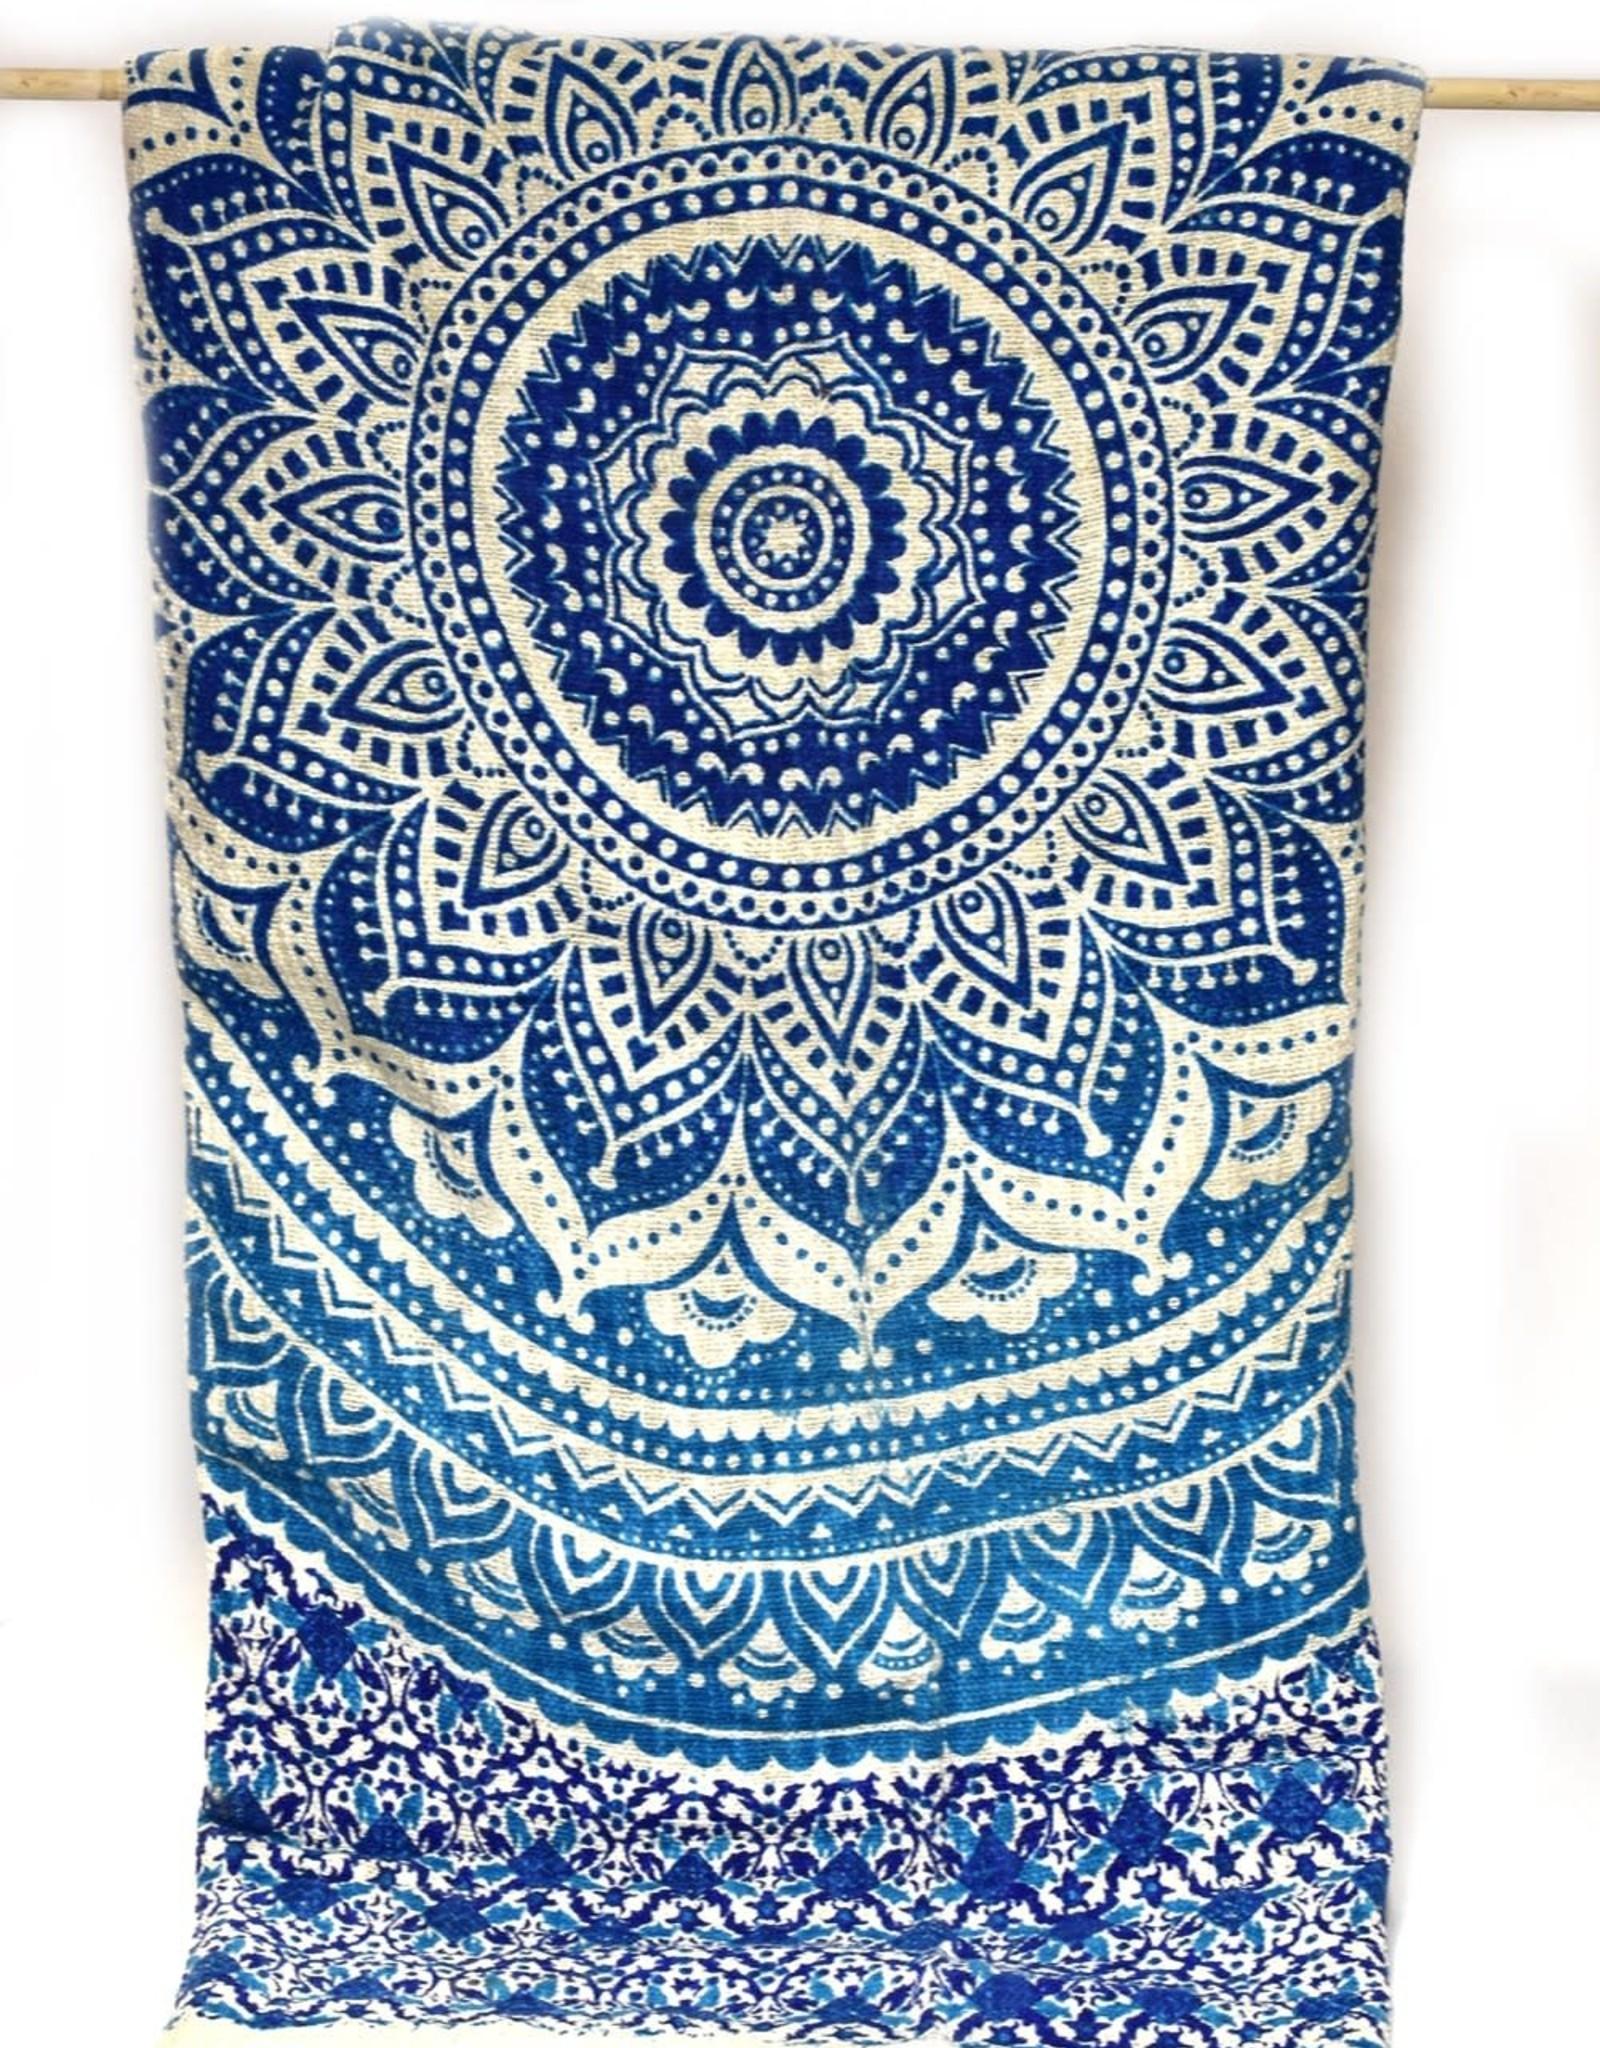 Bohemian Tapestry Blue/Purple Tones, India